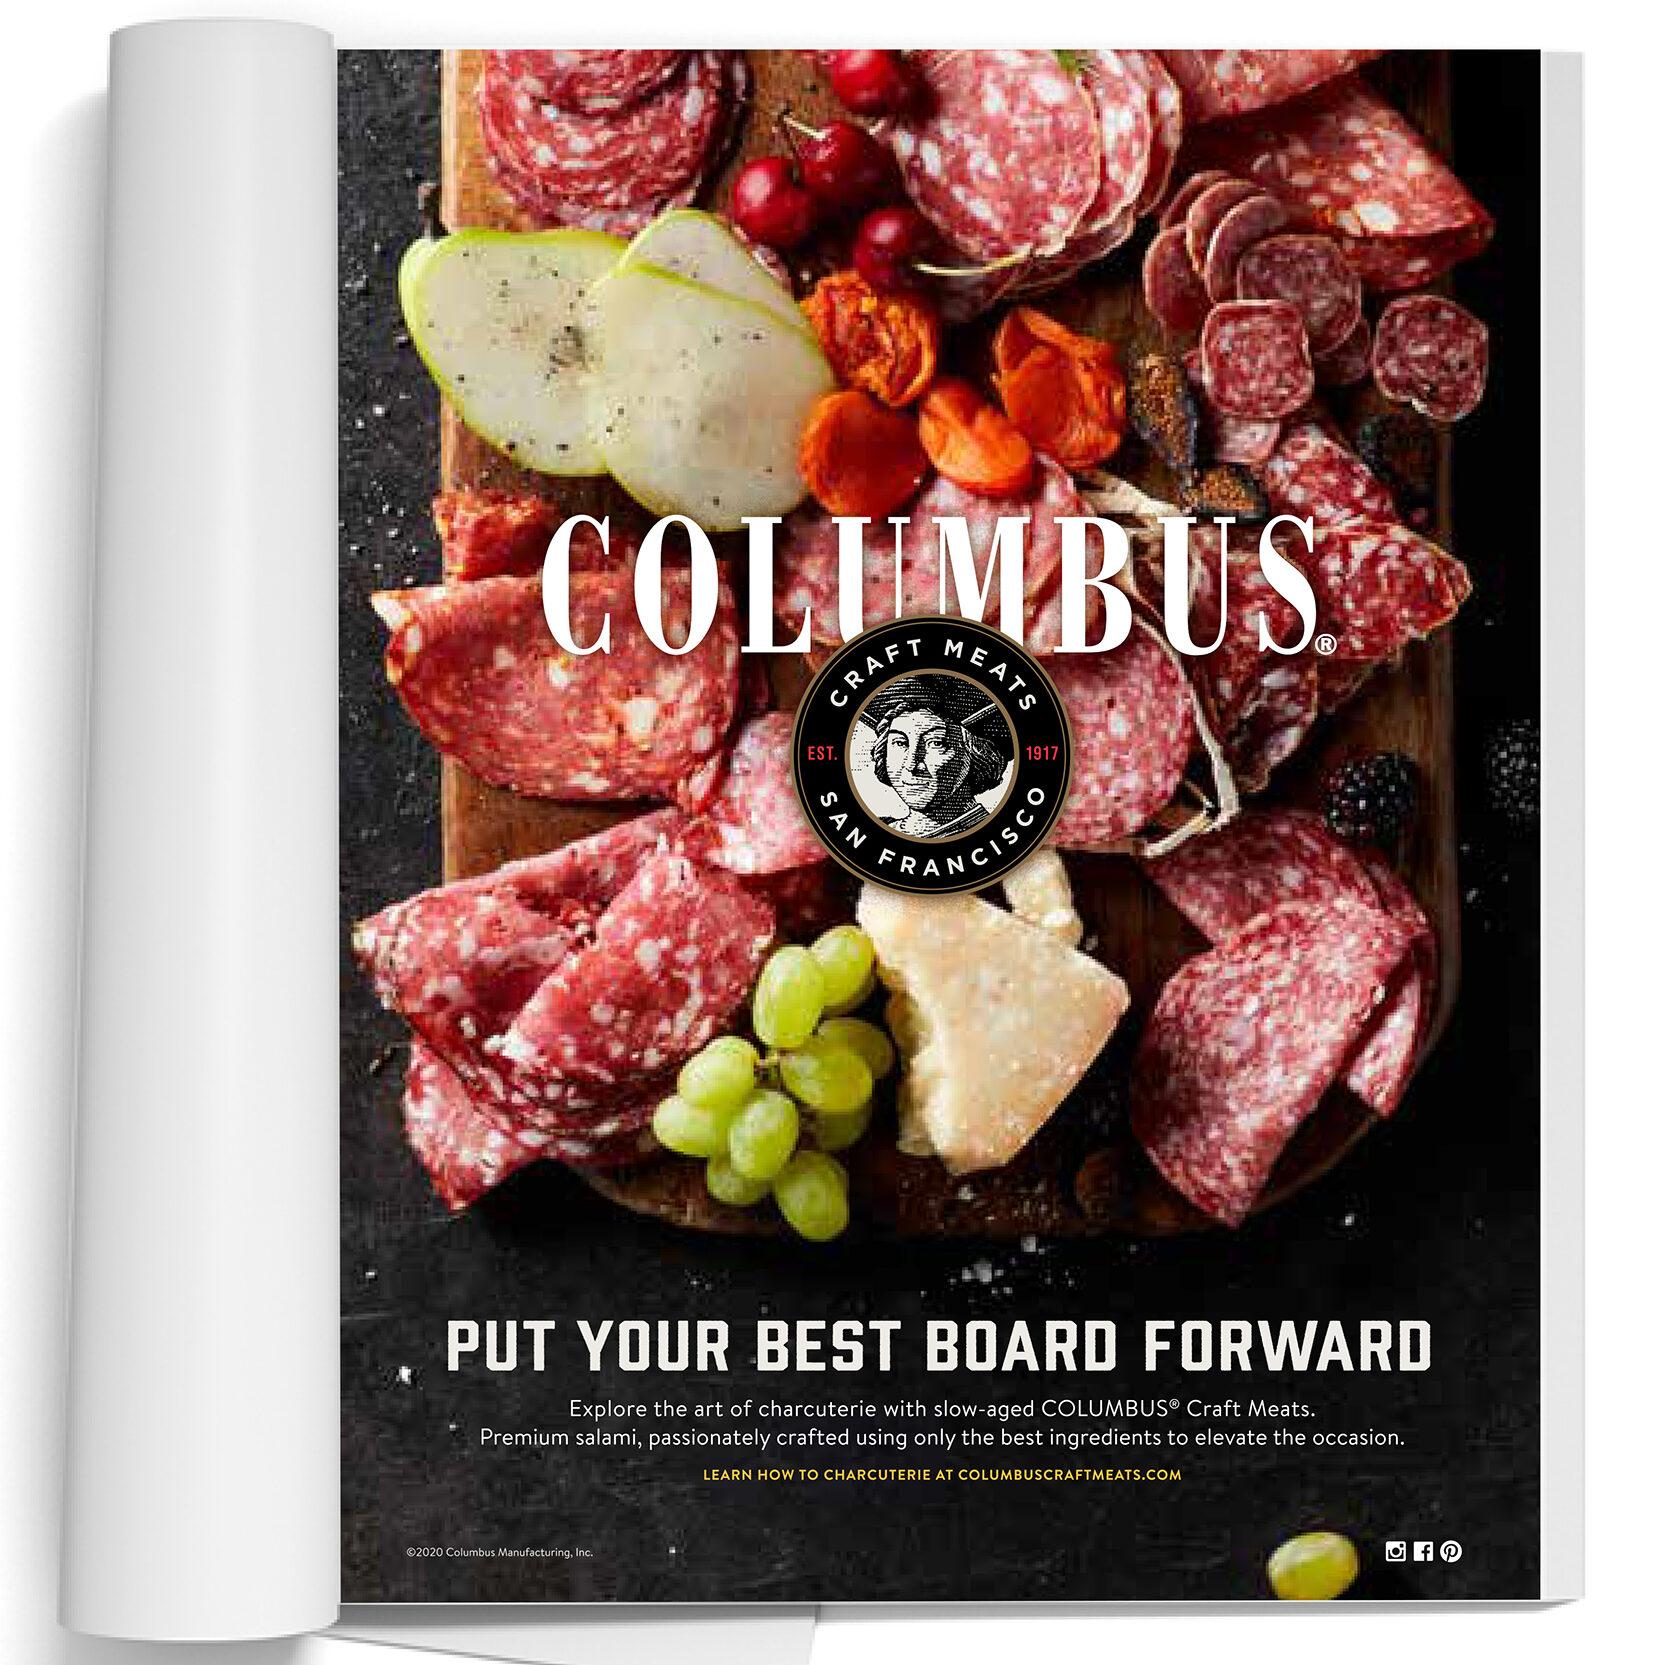 Columbus print ad, Put your best board forward